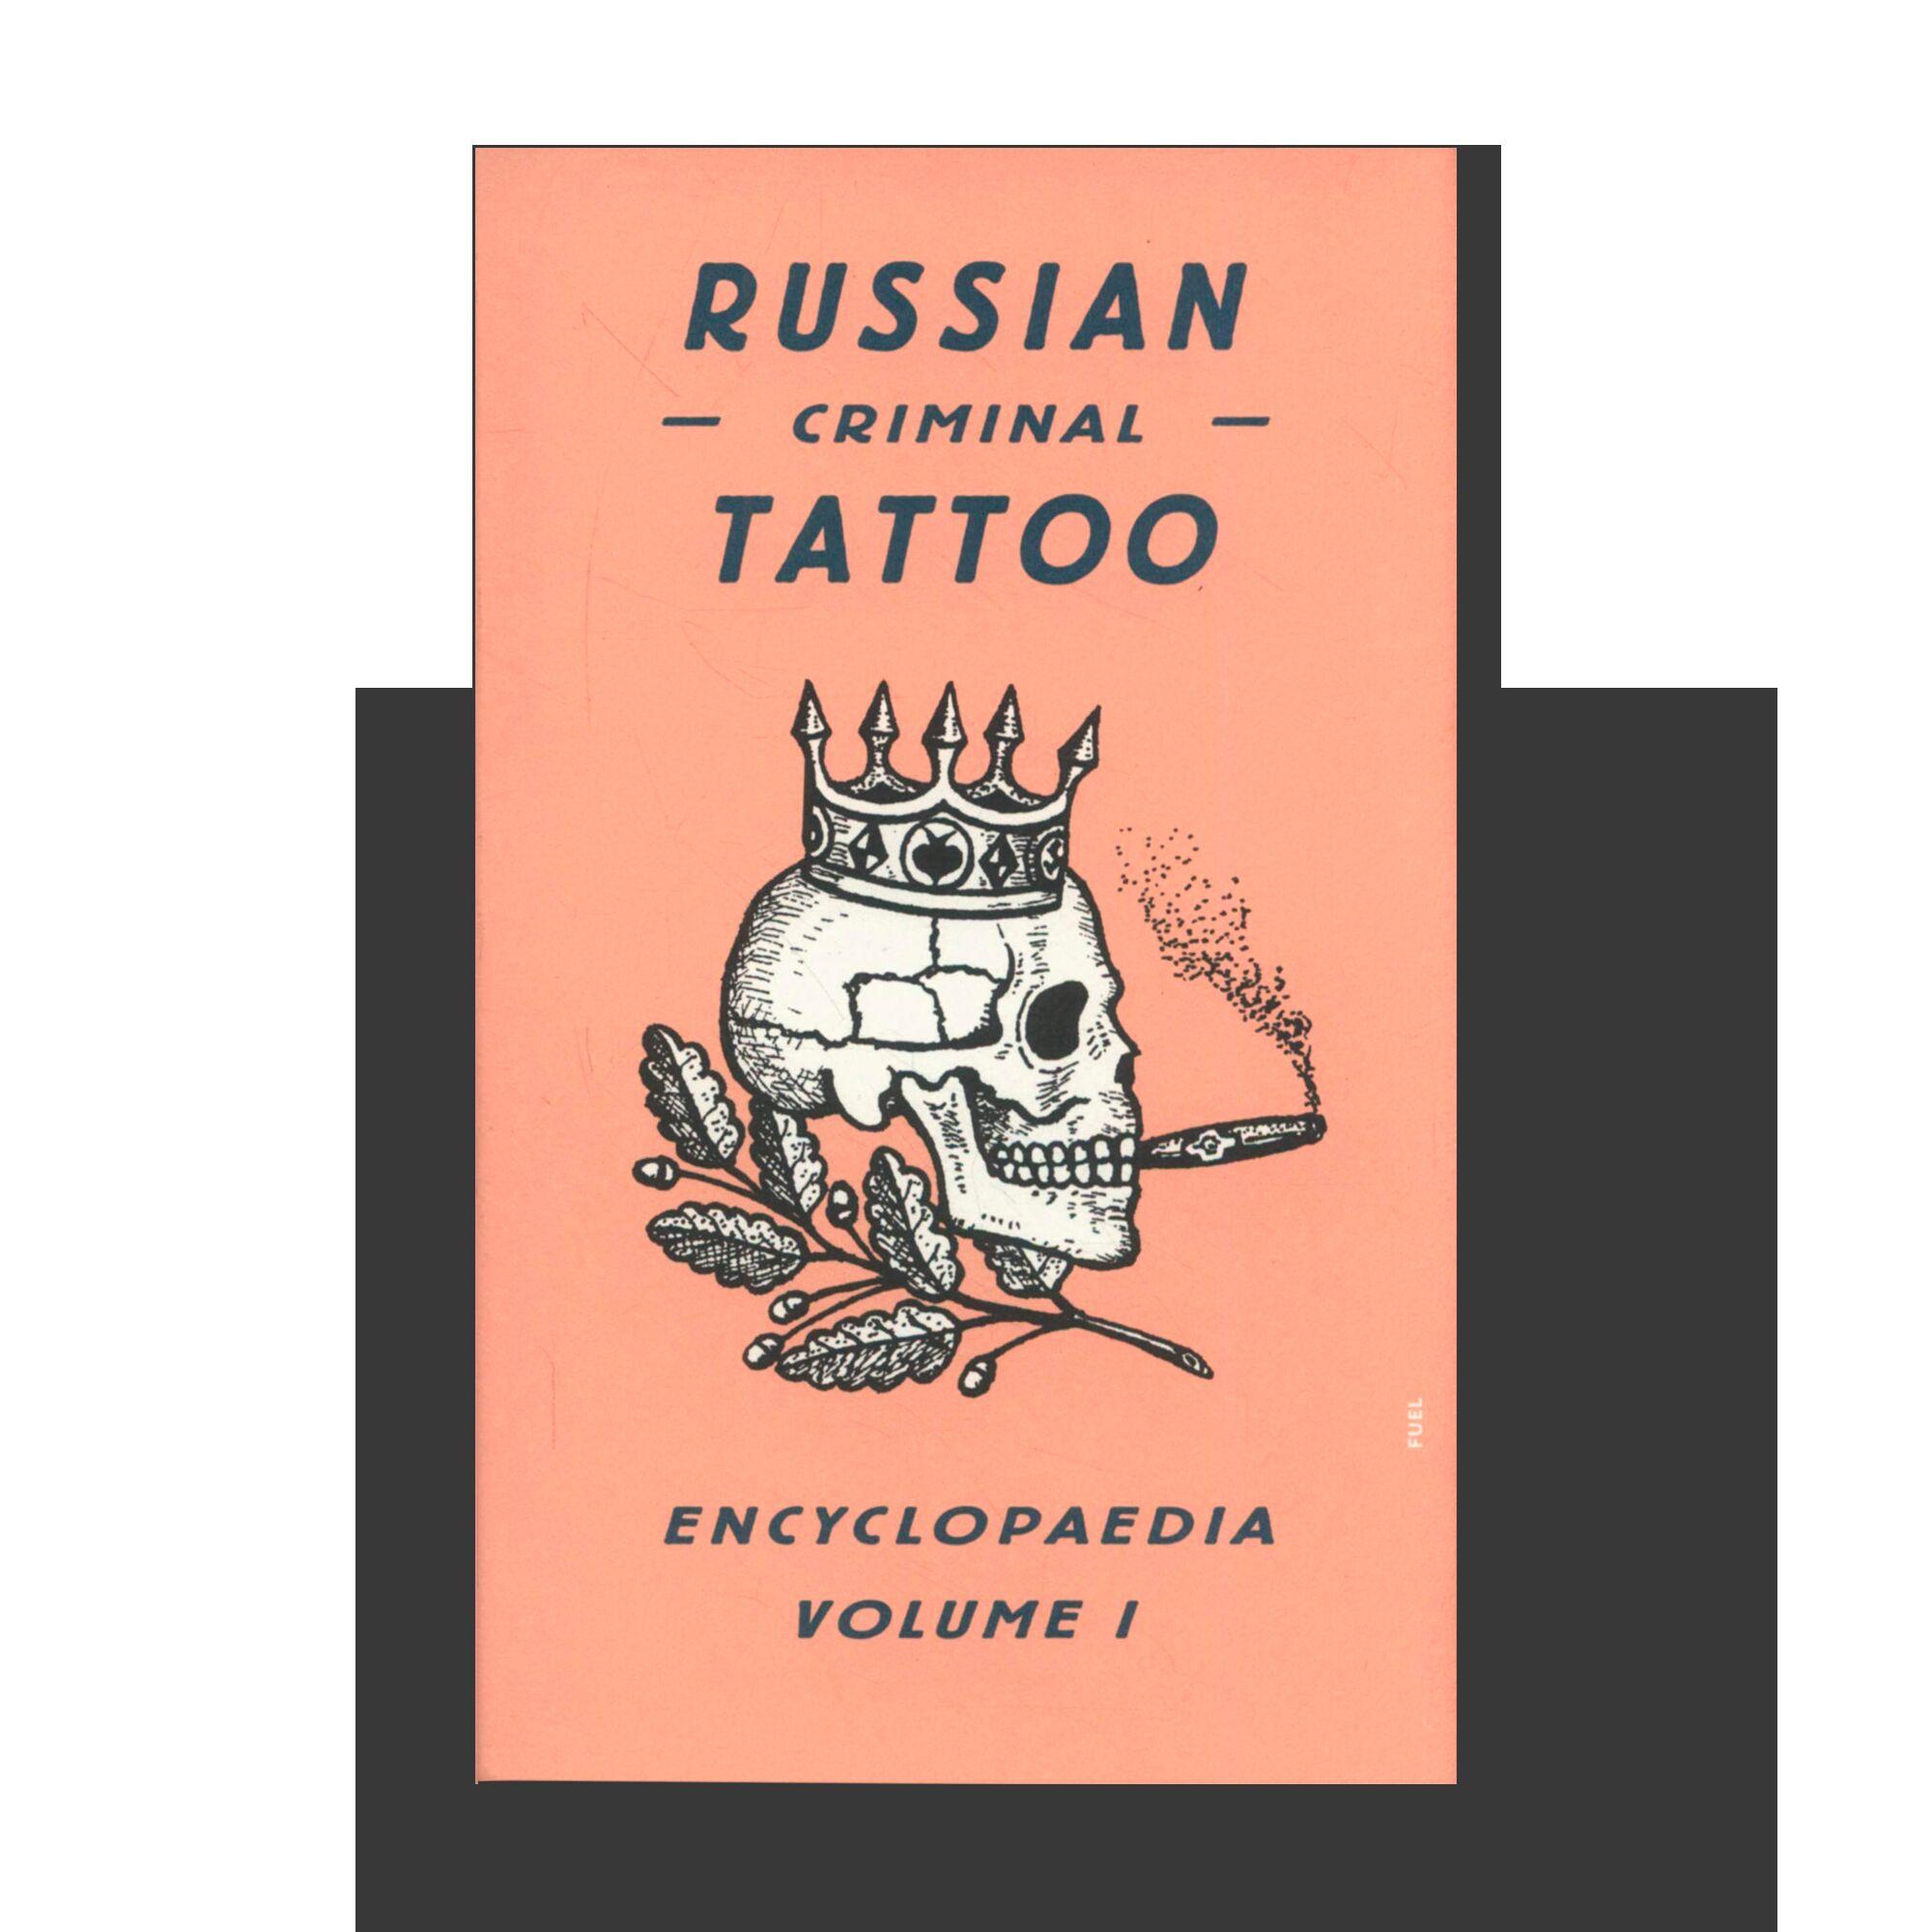 Russian Criminal Tattoo Encyclopaedia. Volume I